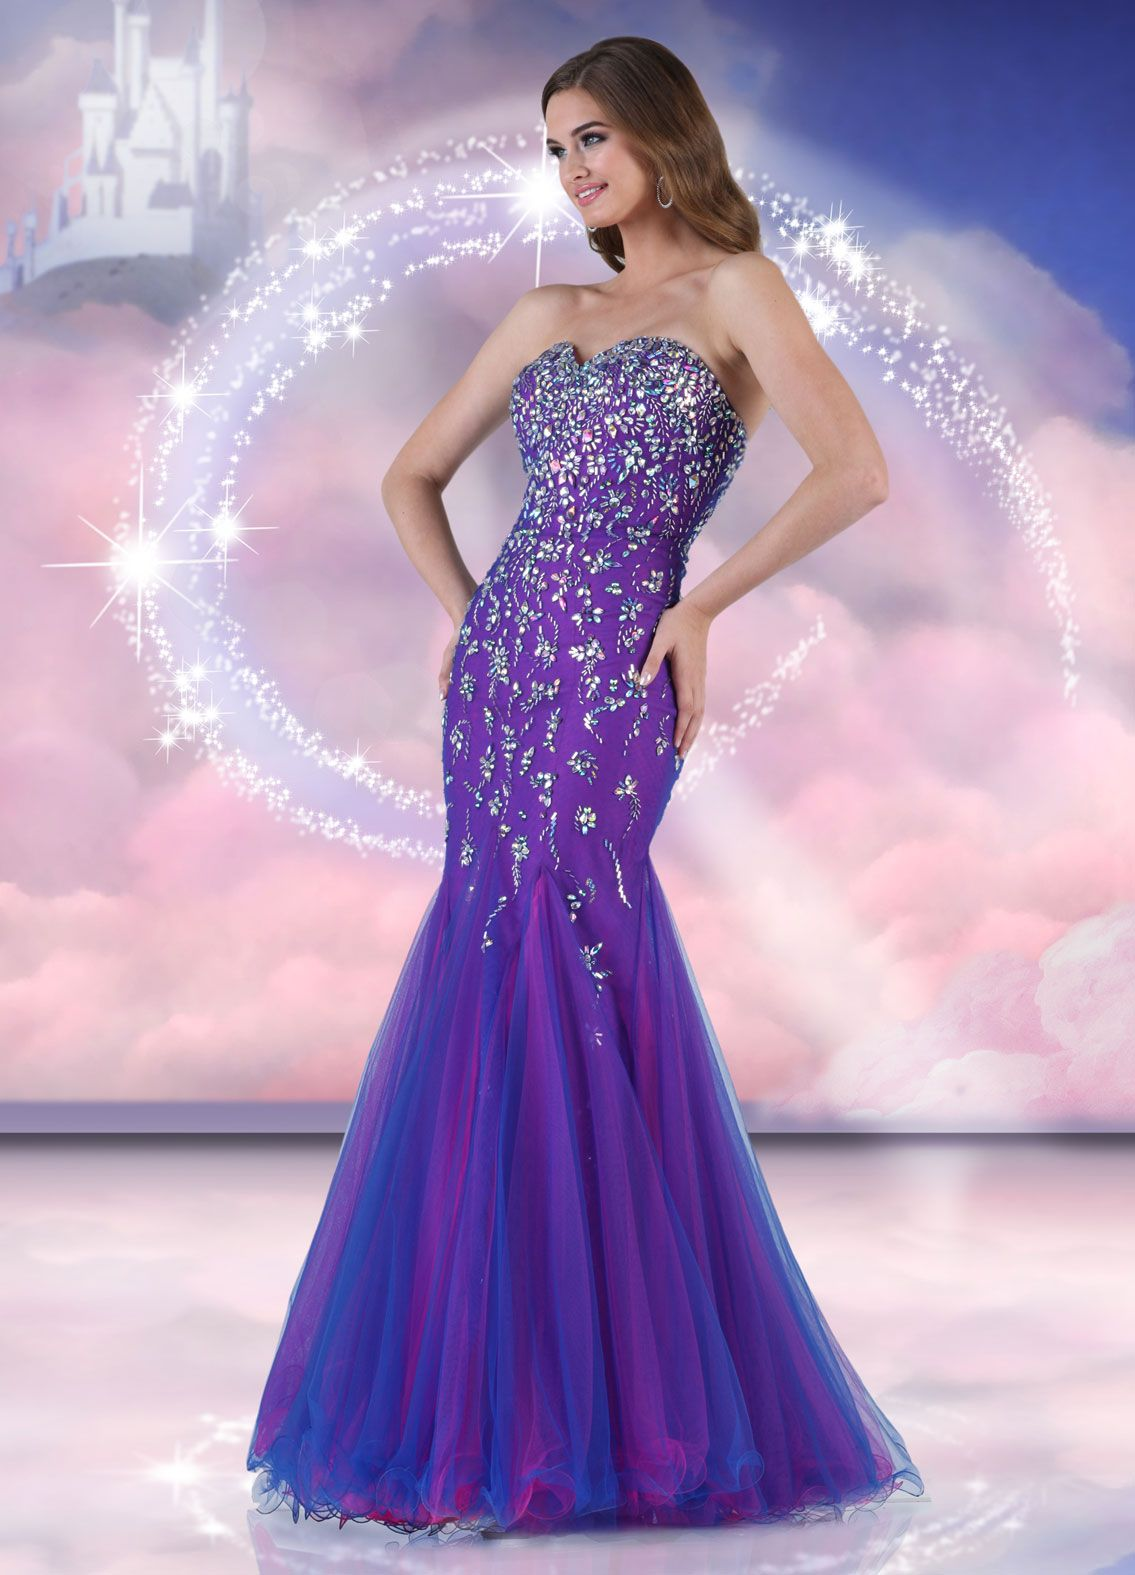 Disney Forever Enchanted Prom Dresses $$$$$$ | ♡ PROM ...